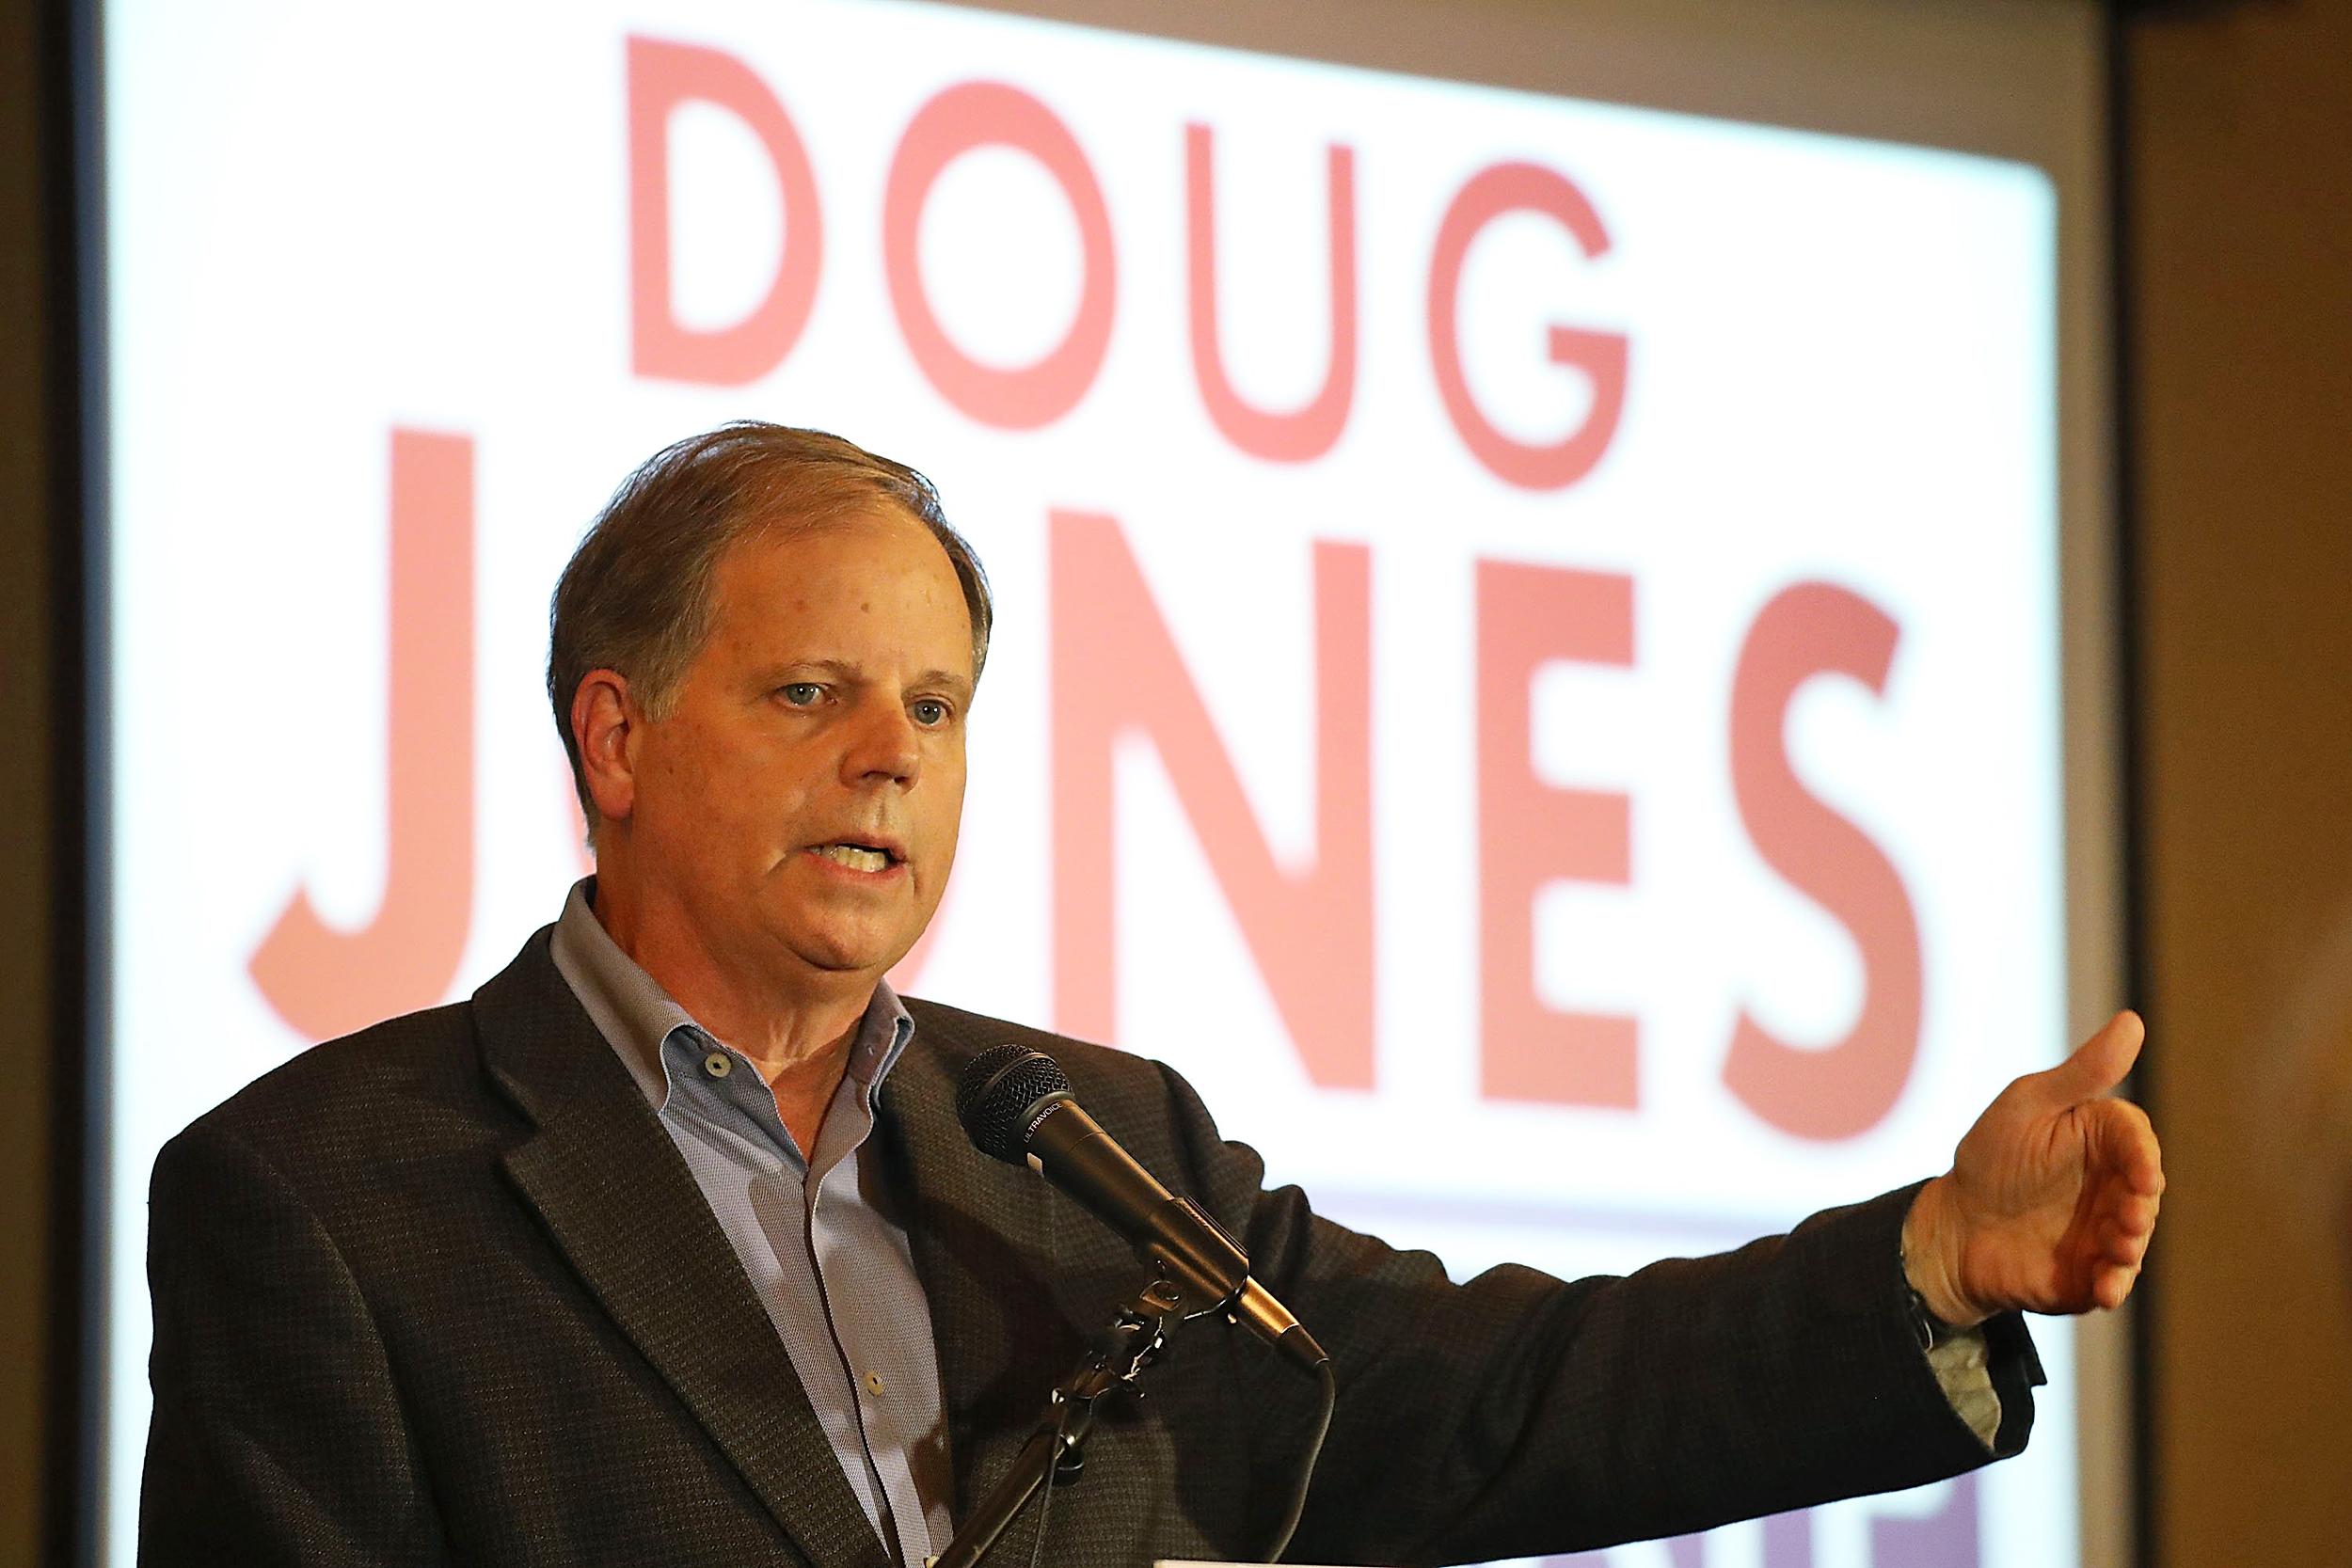 Image: Alabama Senate Candidate Doug Jones Holds Women's Wednesday Campaign Rally